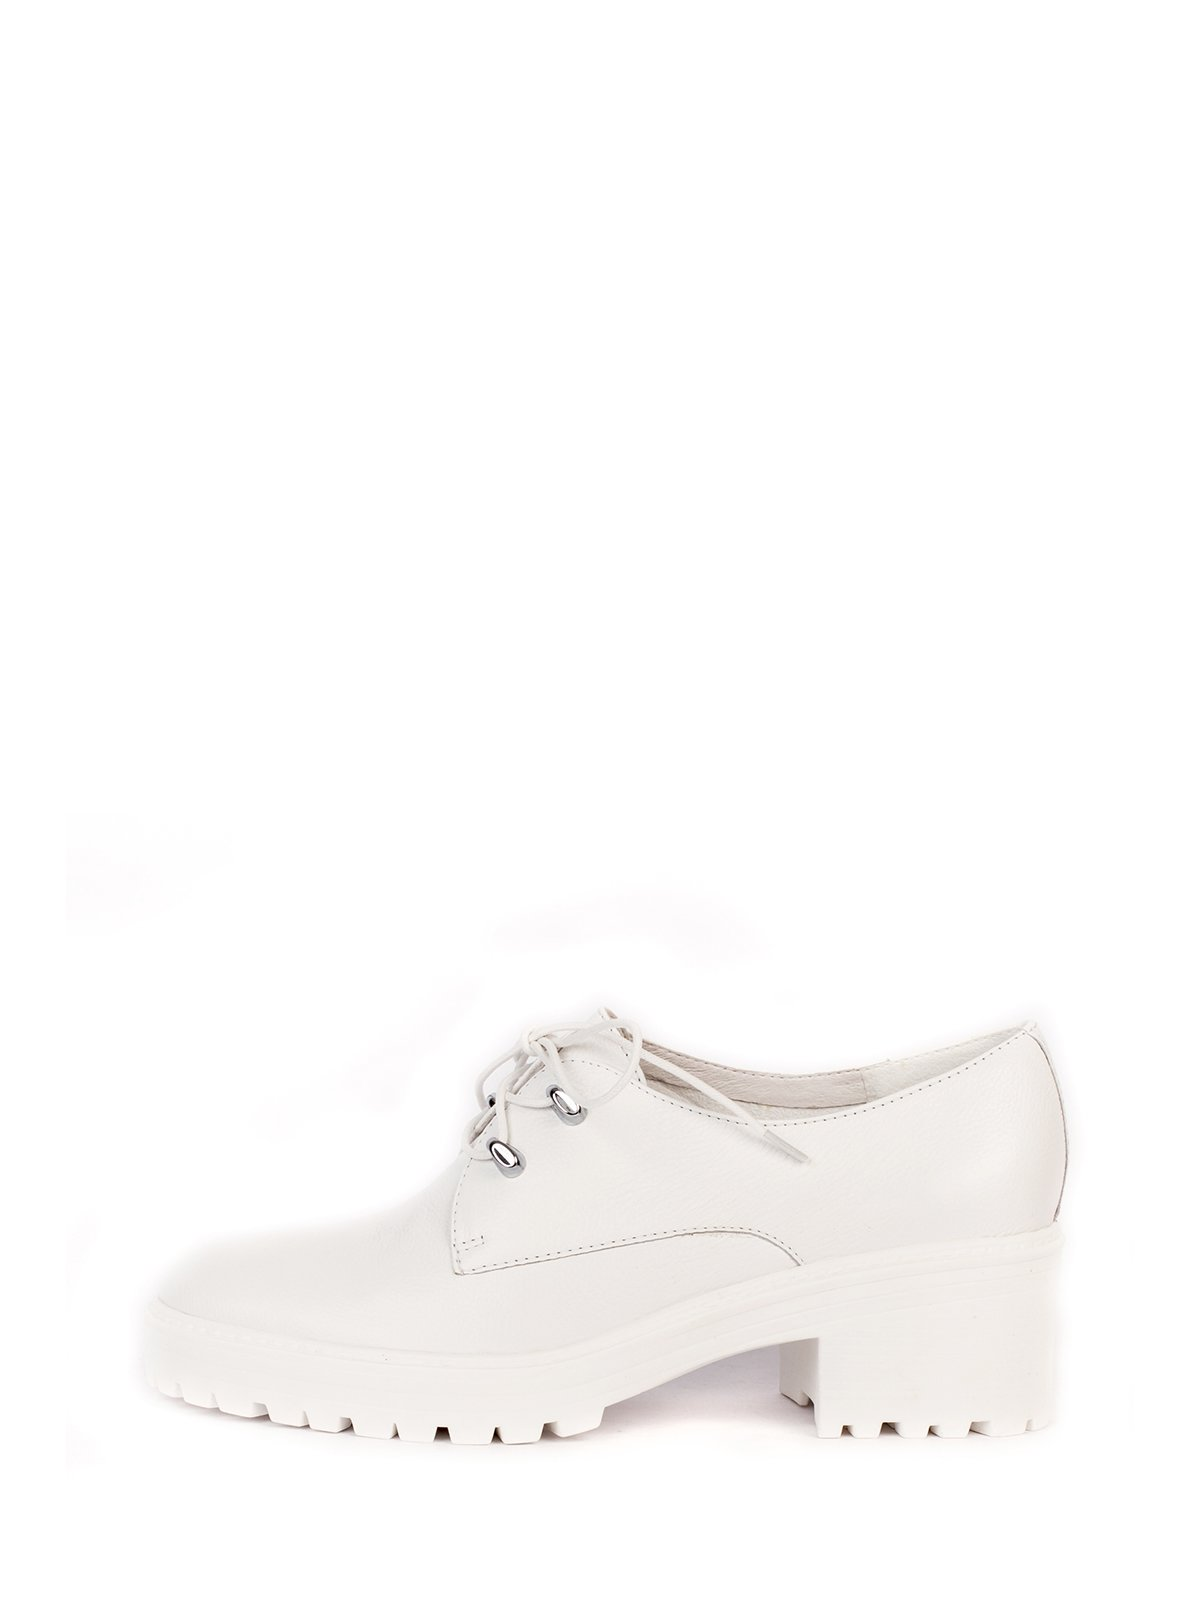 Туфли молочного цвета | 3211496